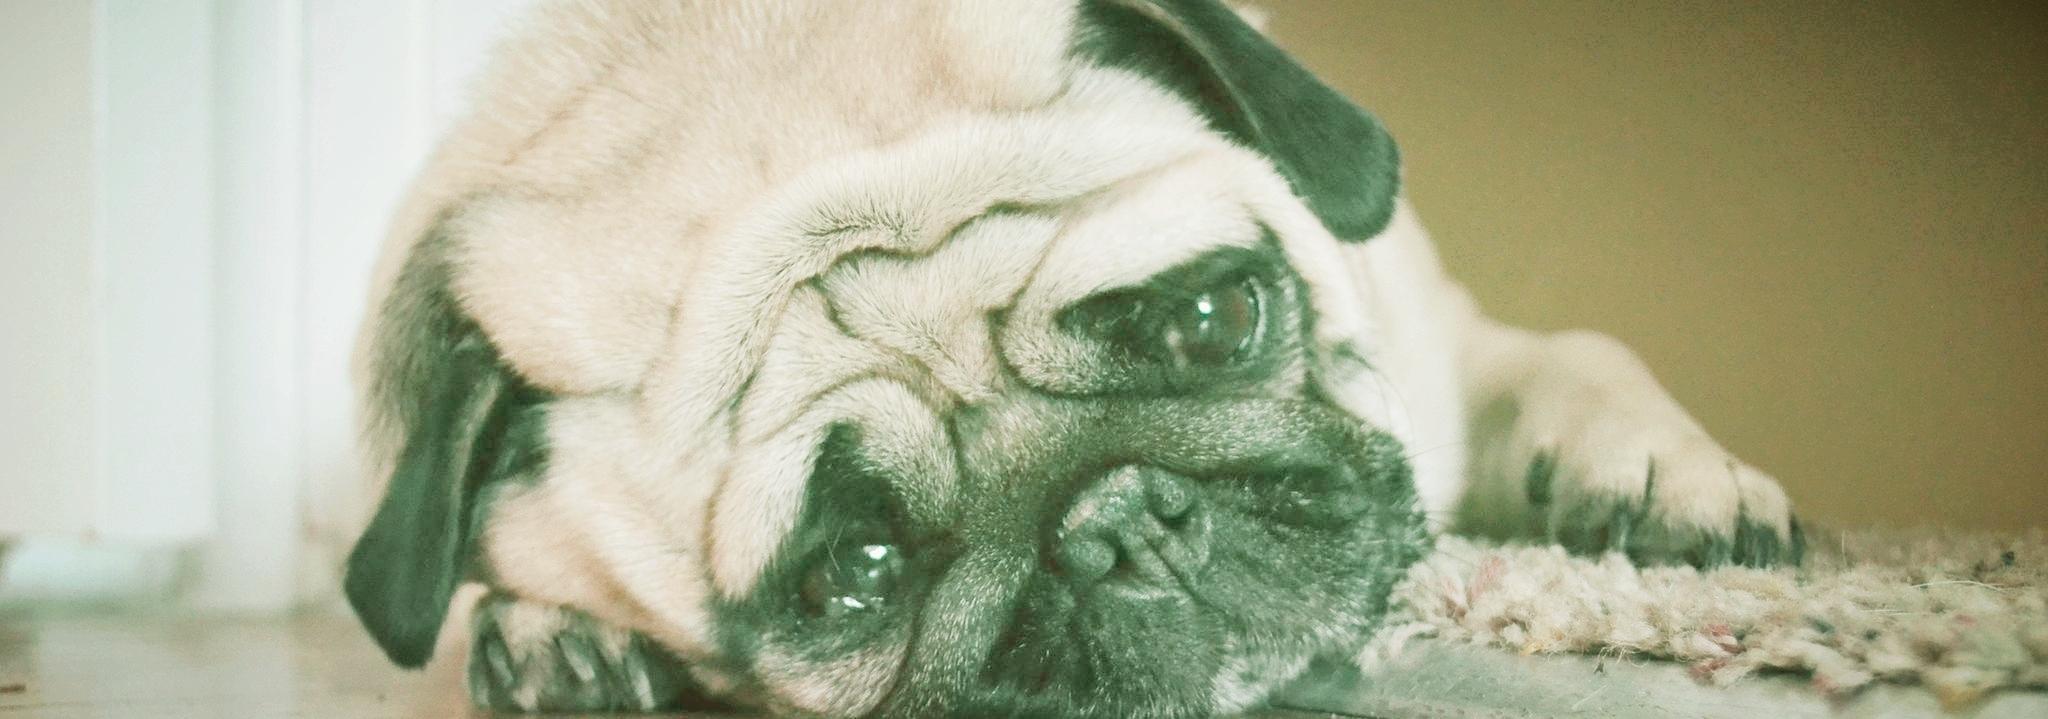 Phoenix at home pet euthanasia